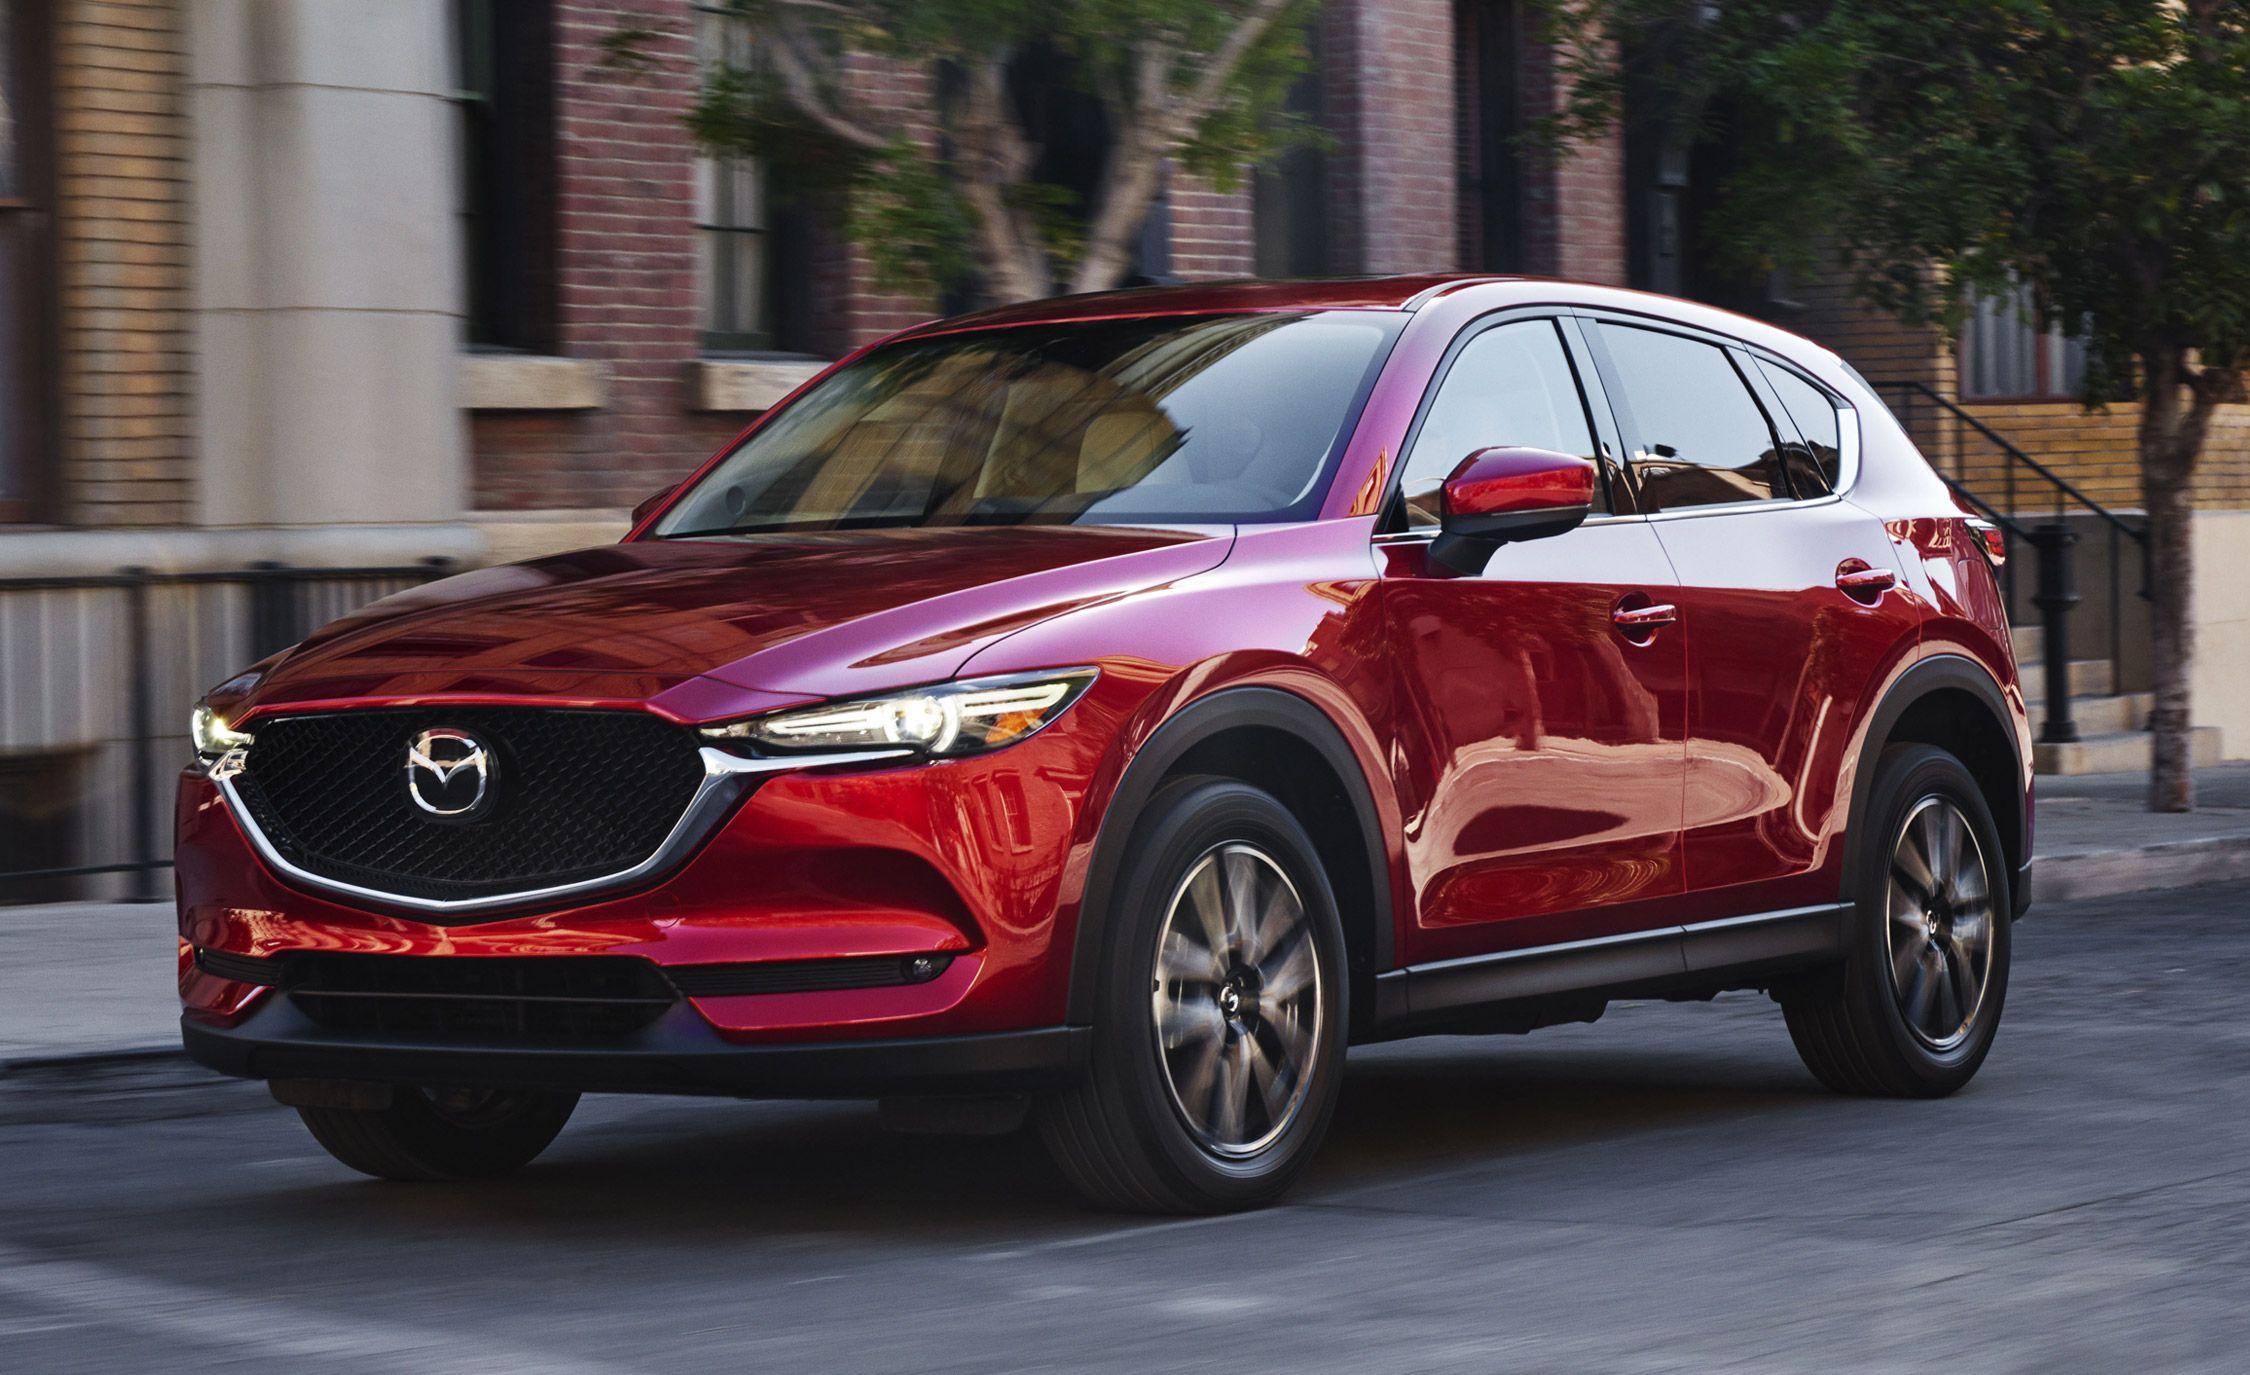 2018 Mazda CX-5 Diesel: Increased Efficiency for the Lovable CX-5